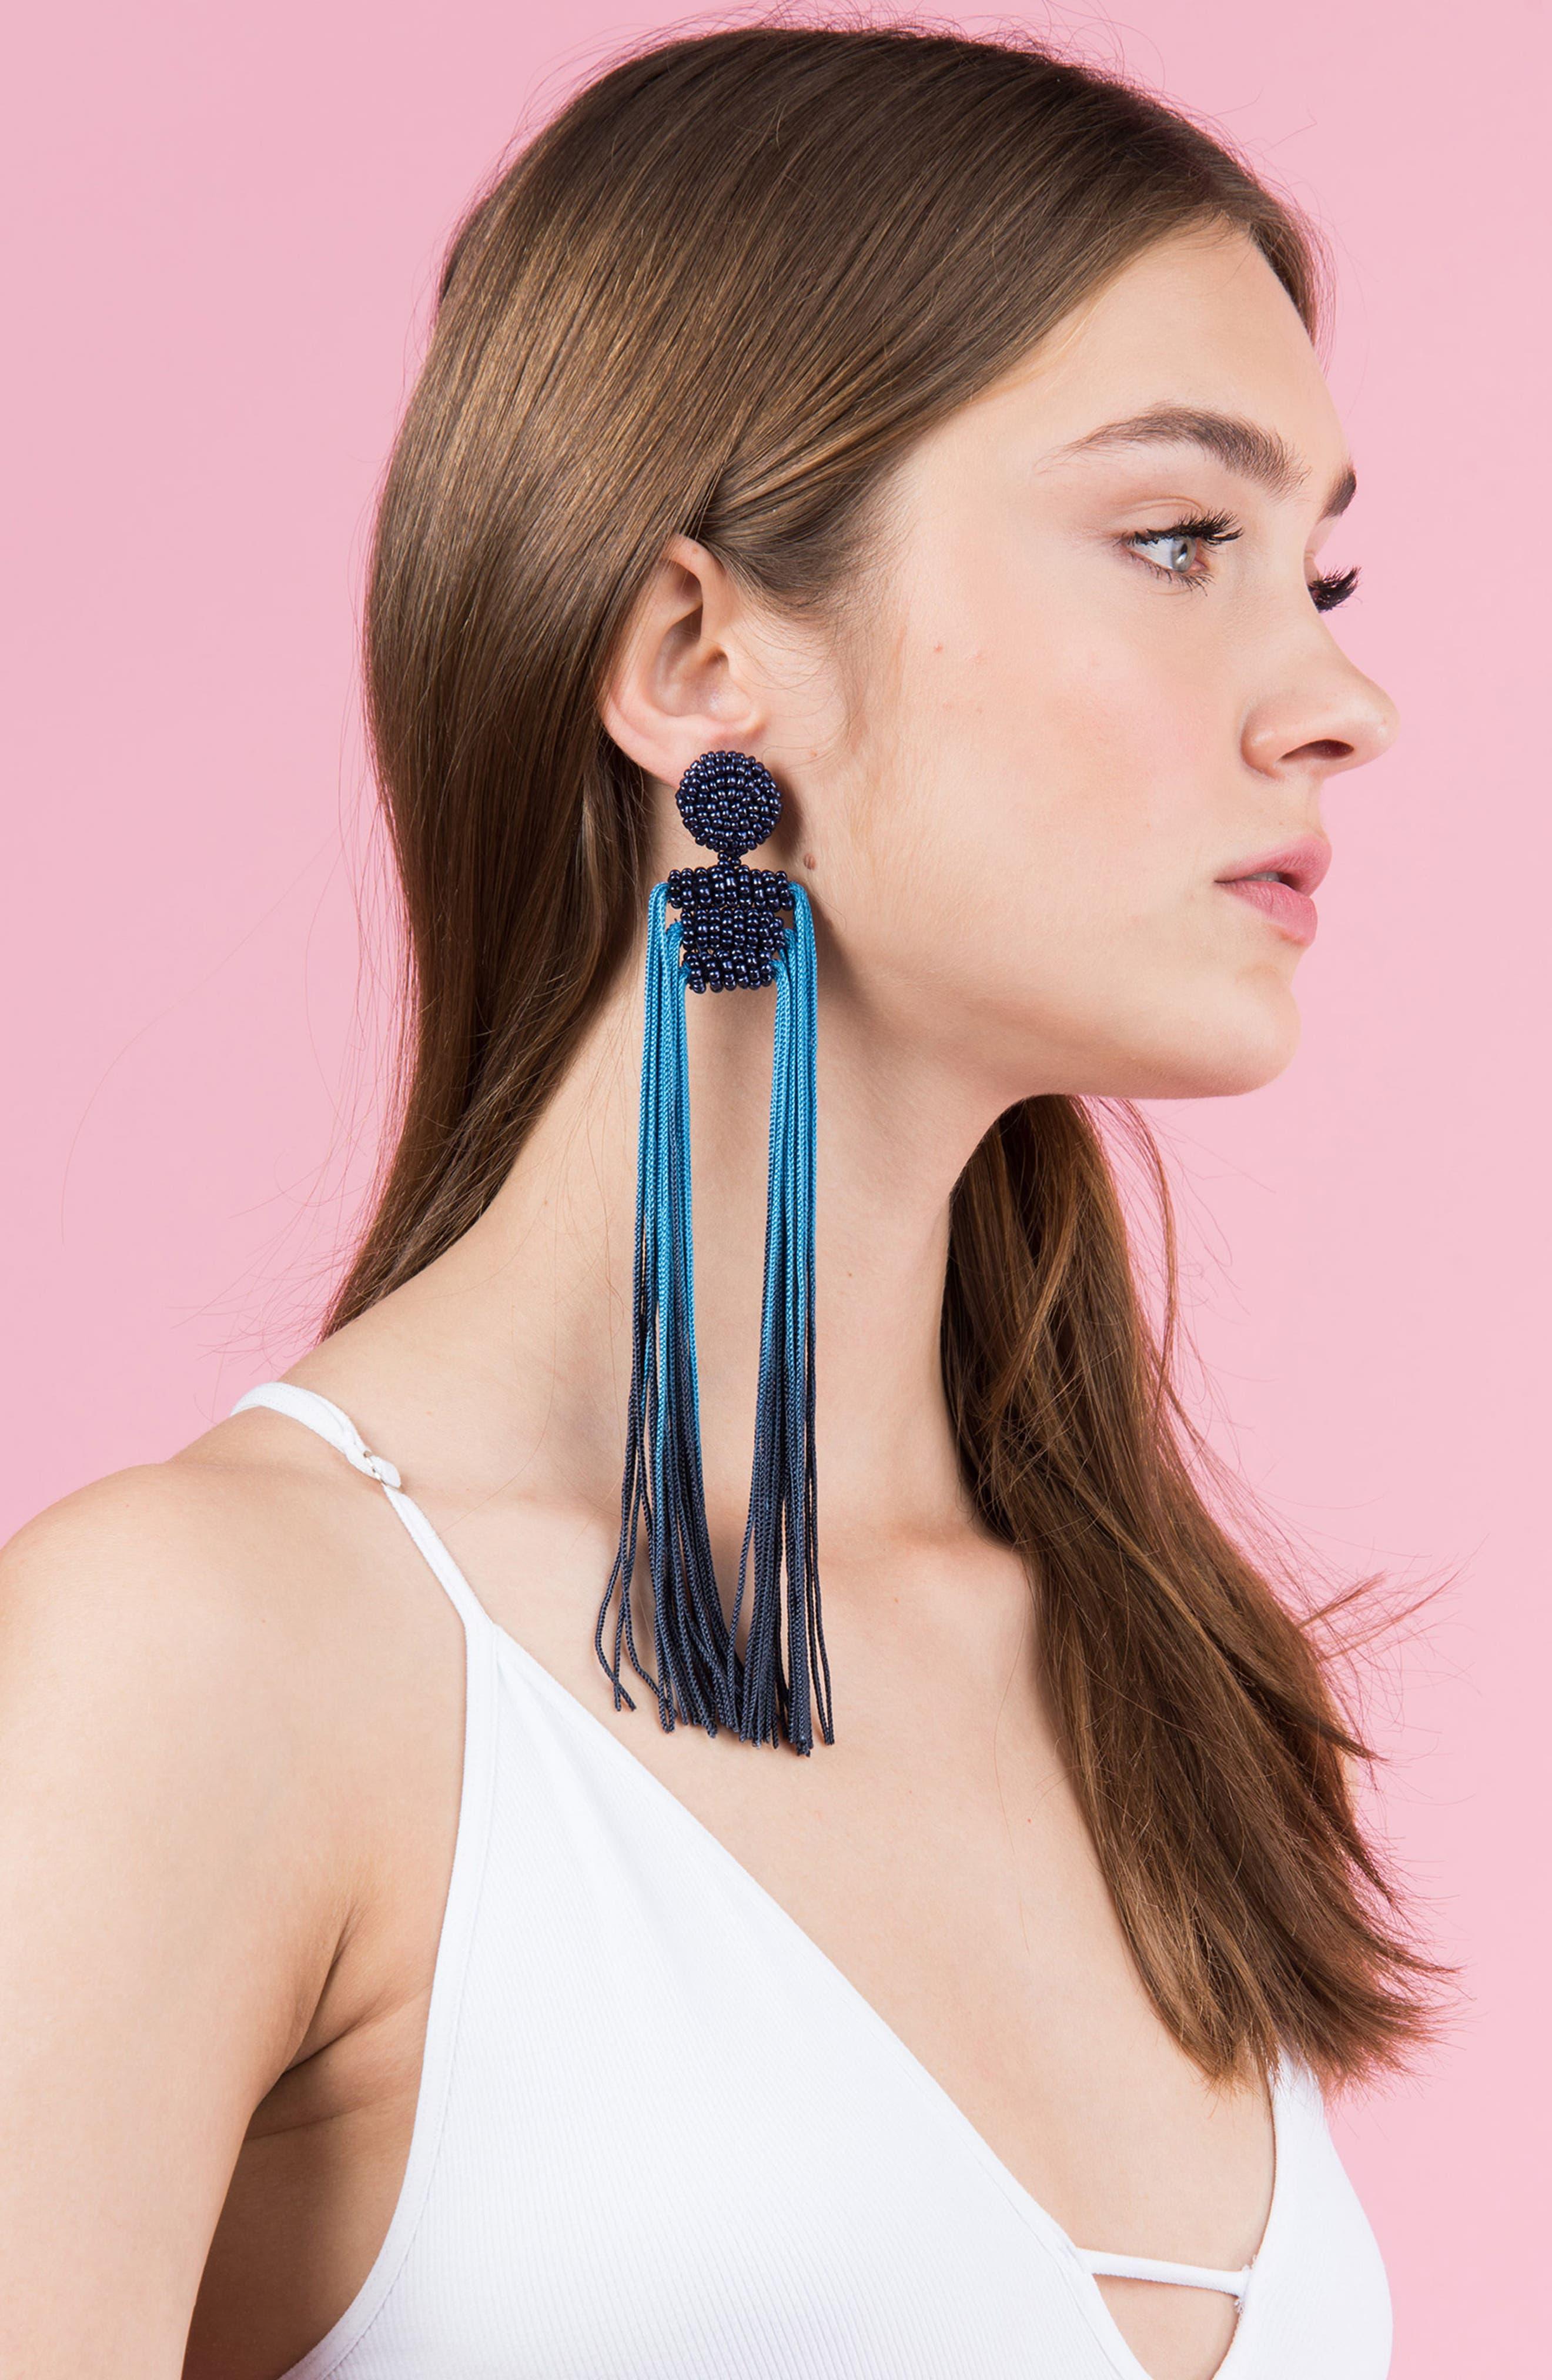 Tropicana Long Tassel Earrings,                             Alternate thumbnail 8, color,                             411